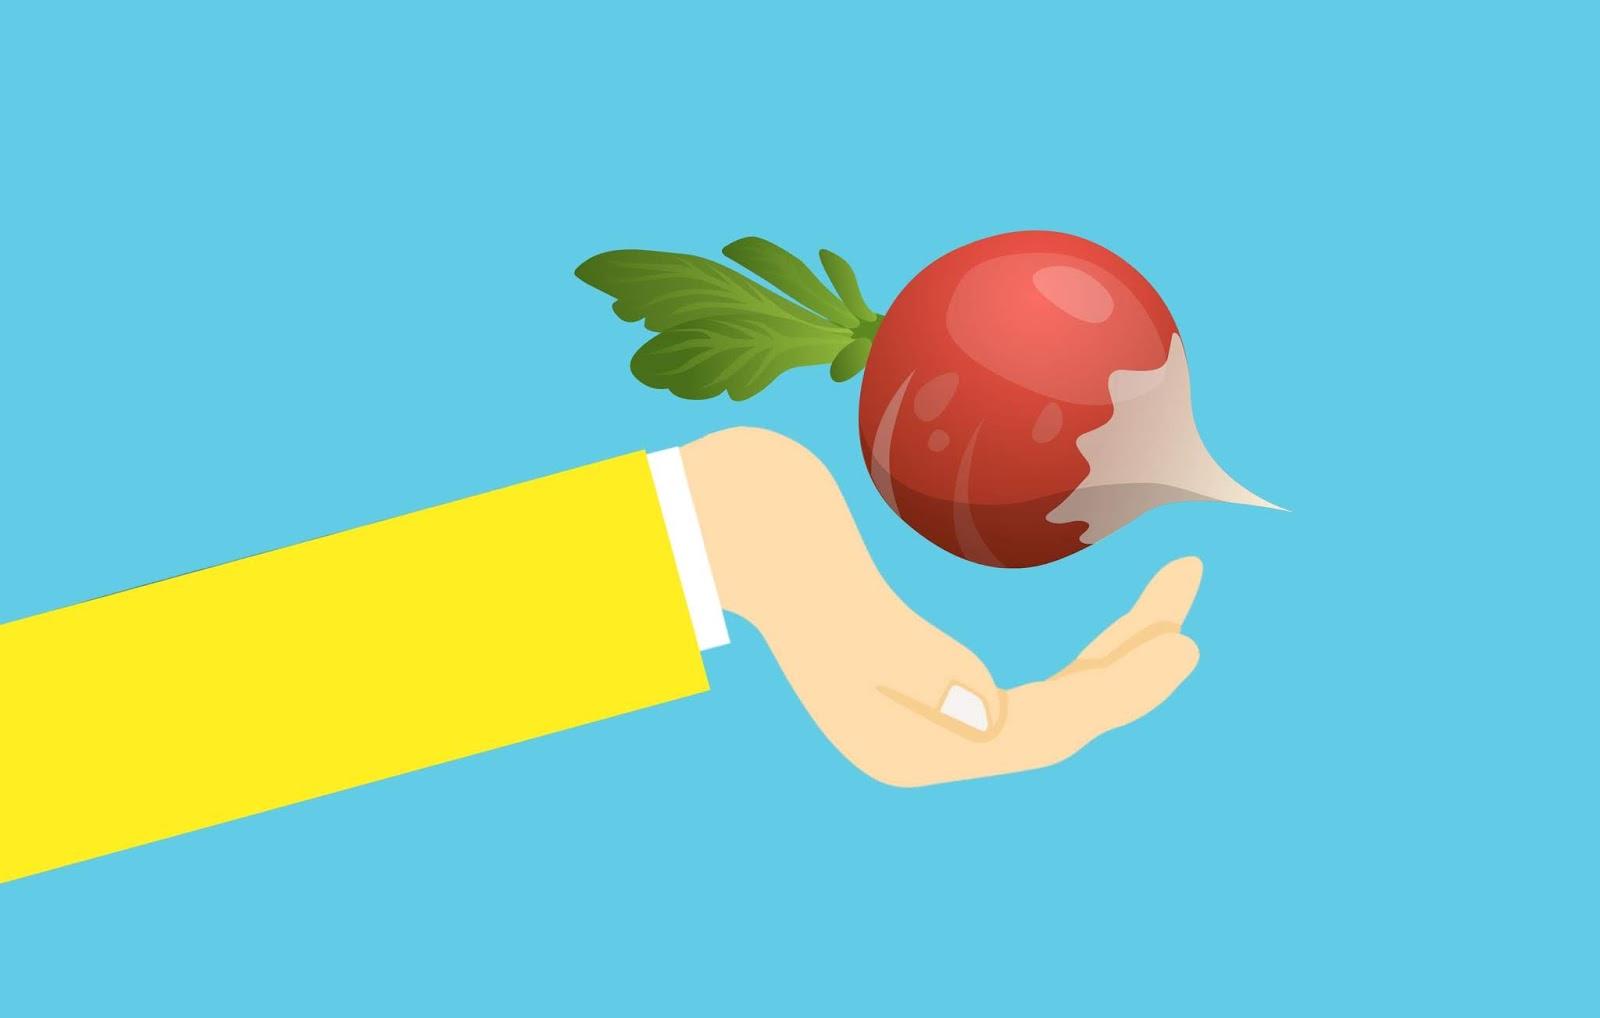 radish, plant, food, red, vegetable, hand, vitamin, nutrition, cartoon, harvest, tuber, organic, cooking, meeting, fresh, healthy, green, purple, agriculture, leaf, harvesting